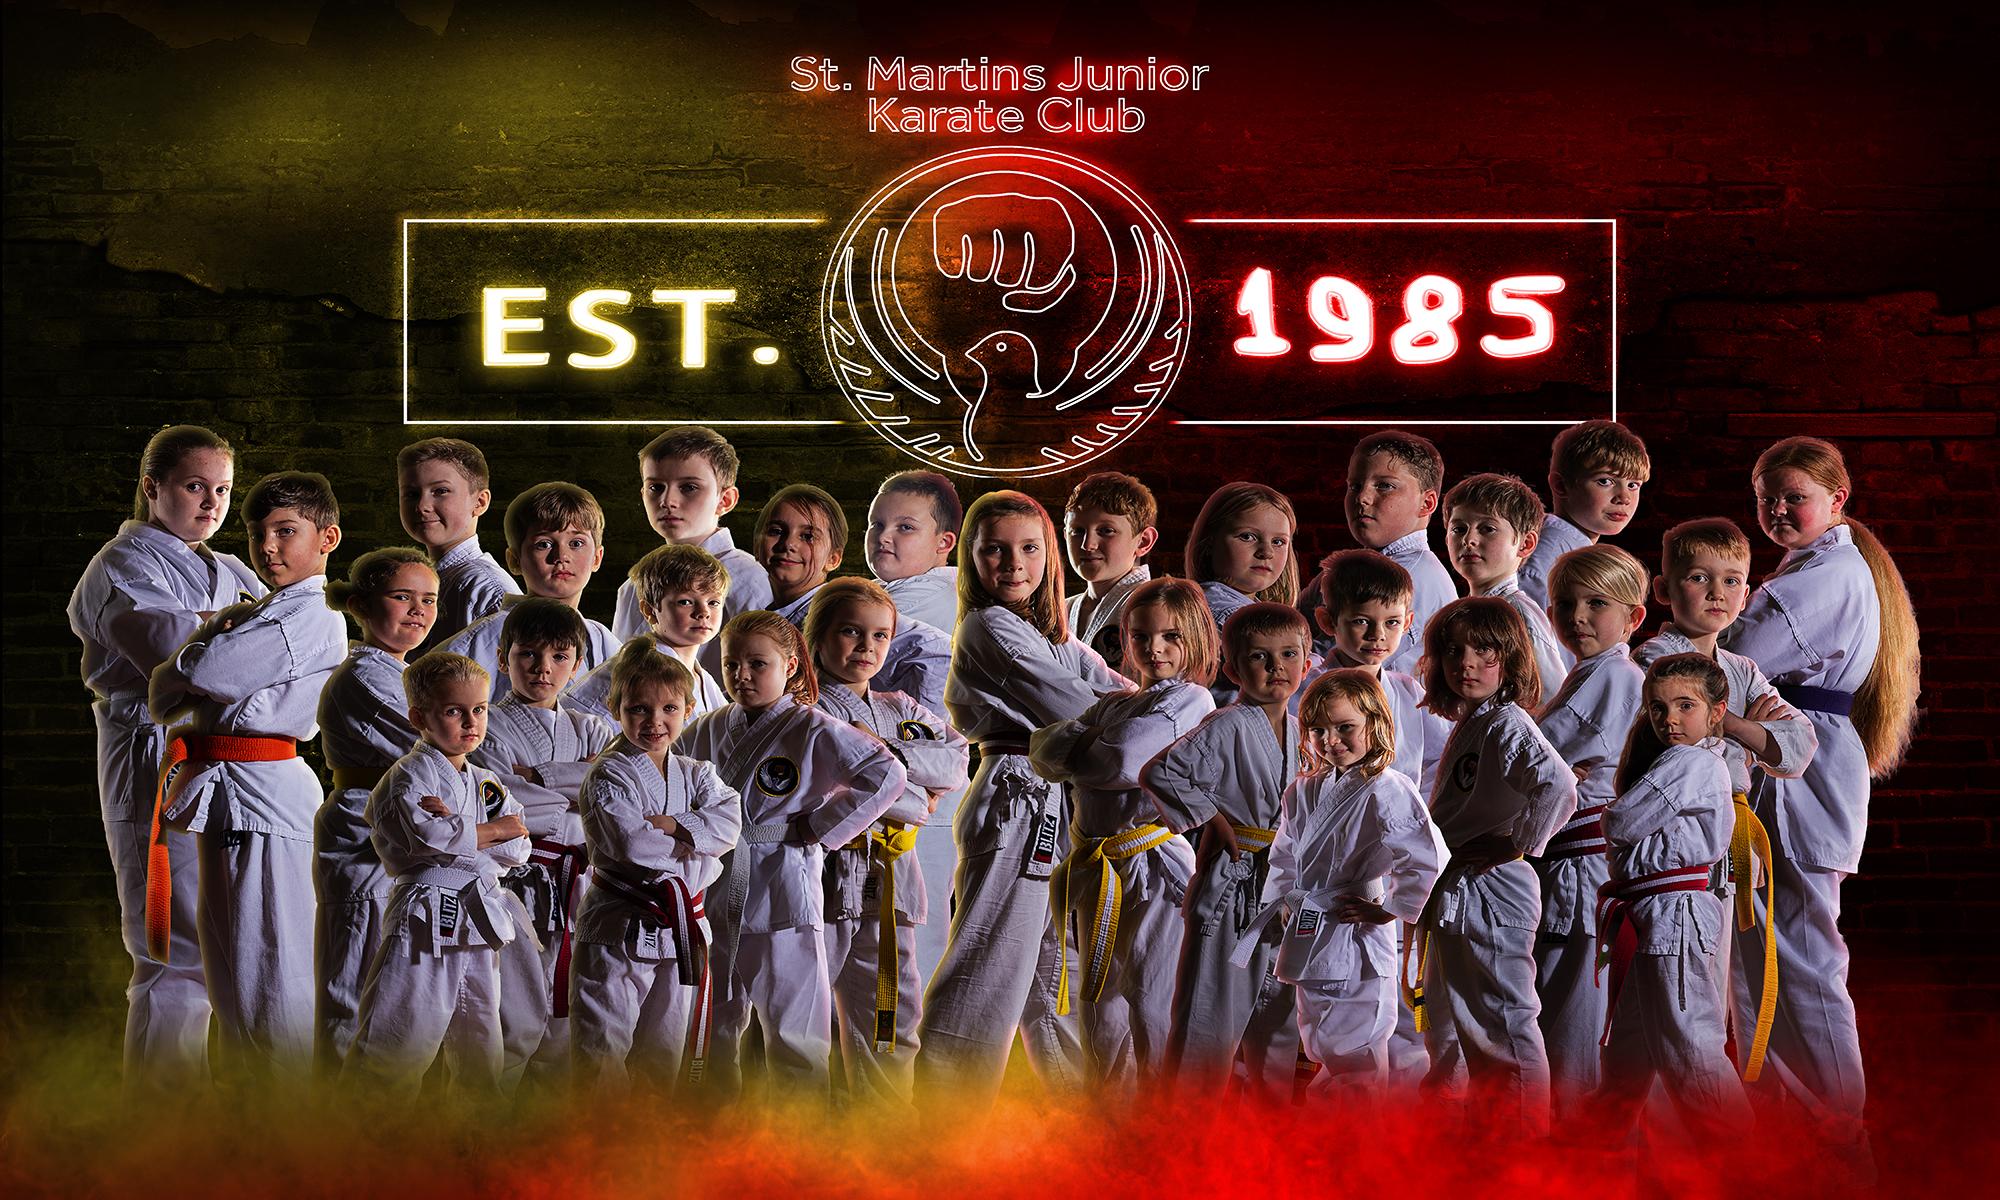 St. Martin's Junior Karate Club